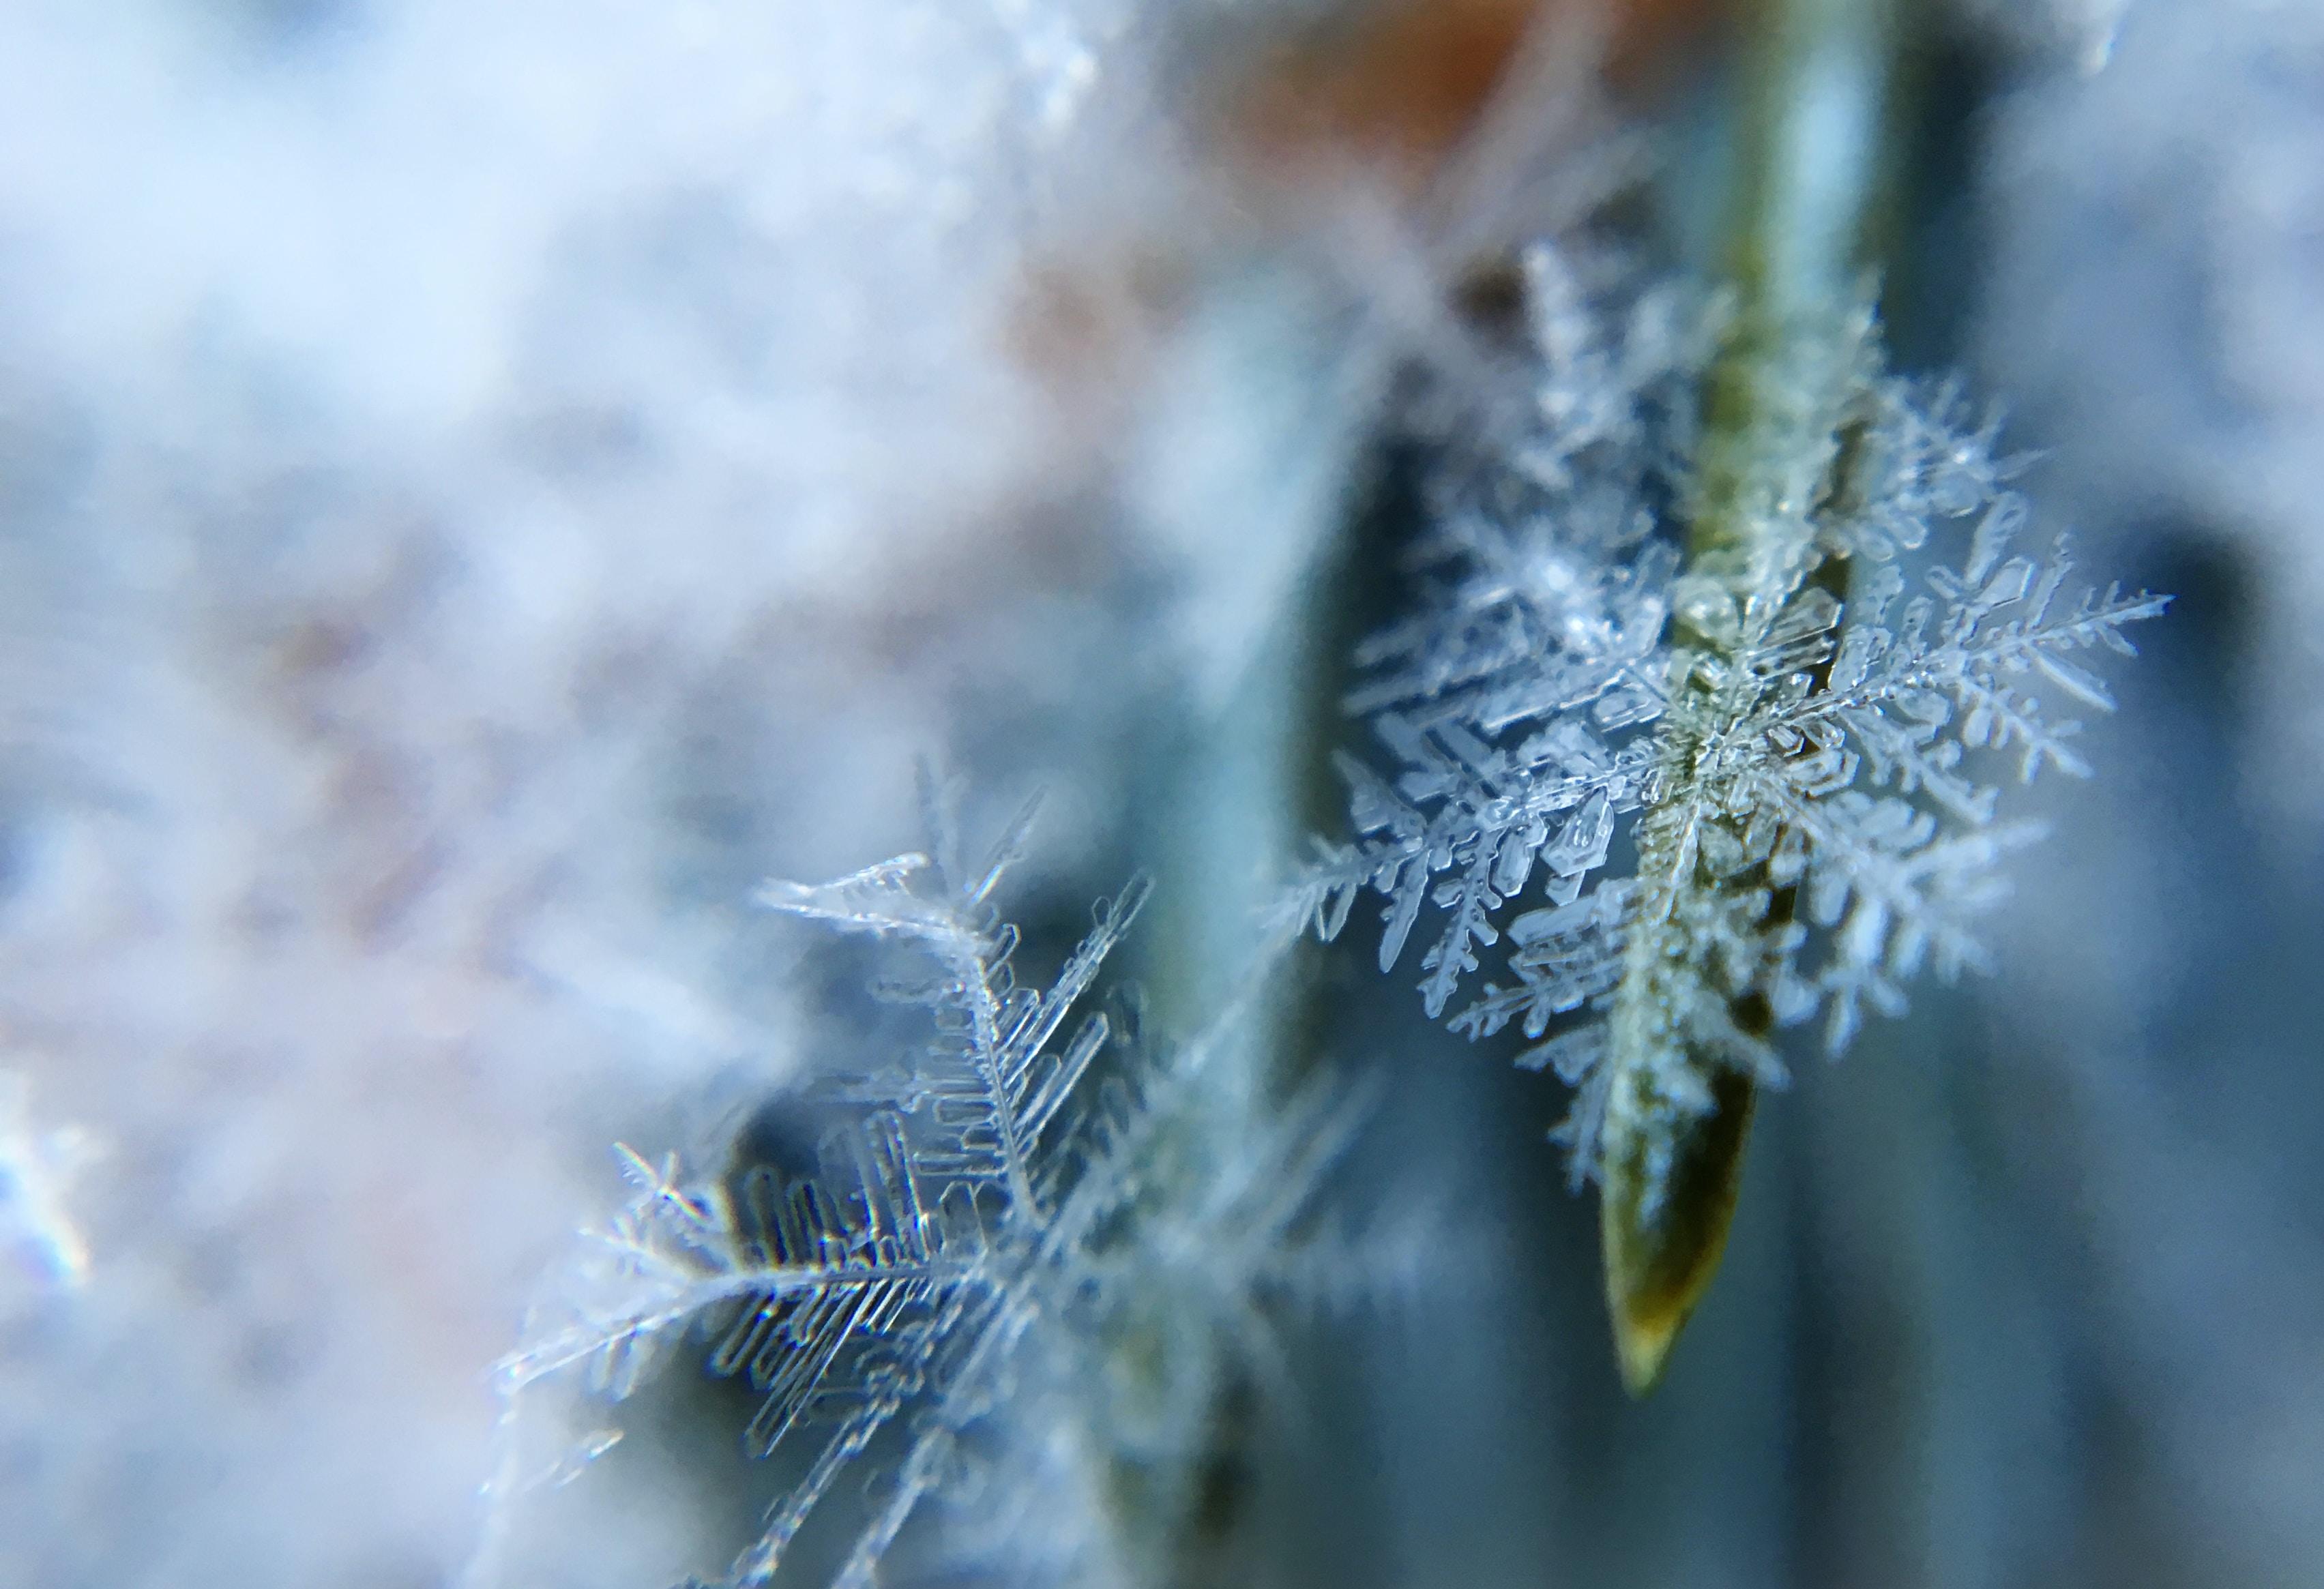 Macro shot of two snowflakes